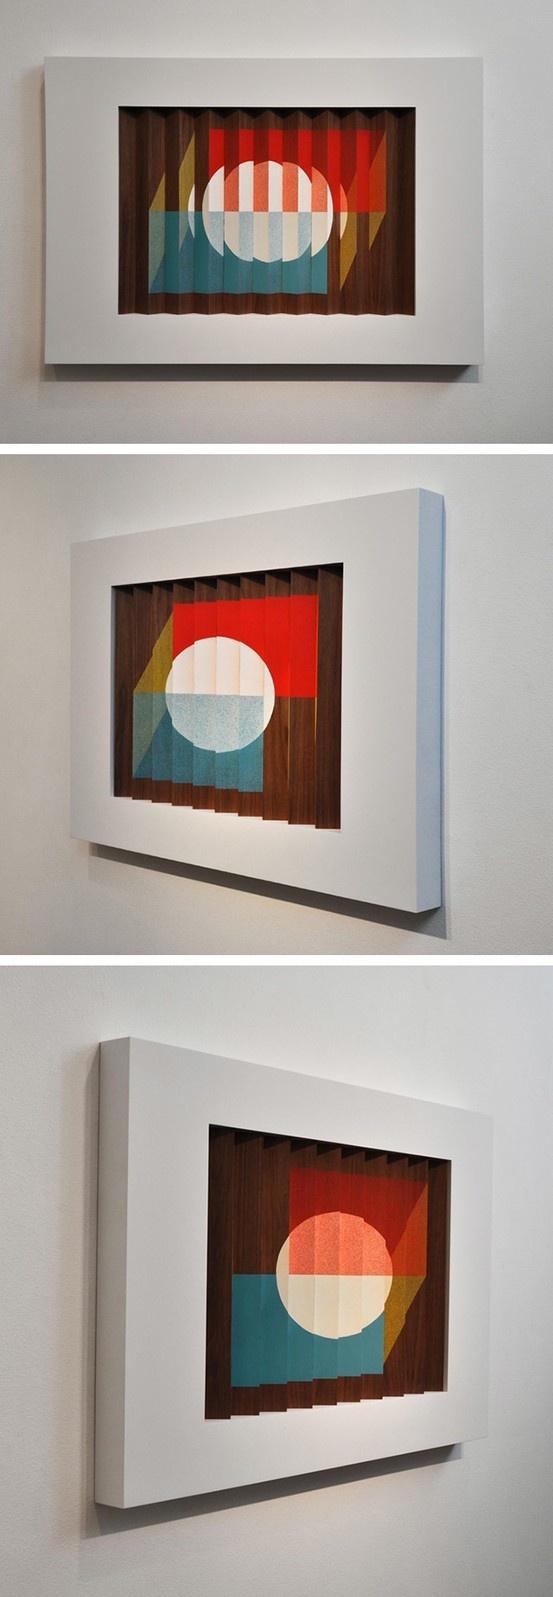 Lenticular Compositions by Christopher Derek Bruno